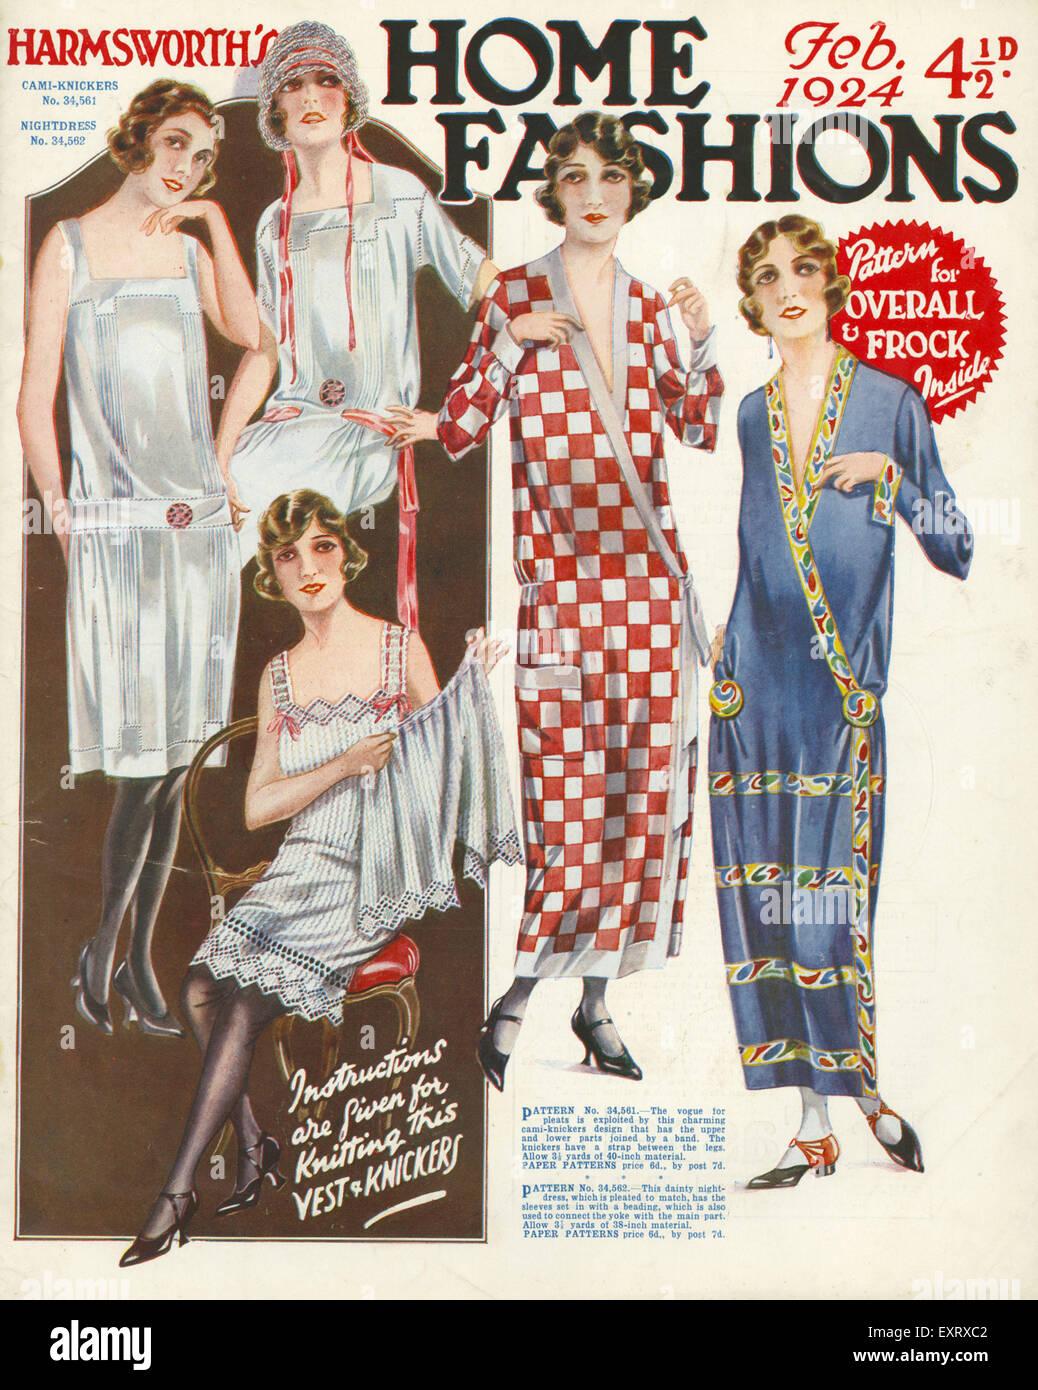 1920s Uk Harmsworth S Home Fashion Magazine Cover Stock Photo Alamy